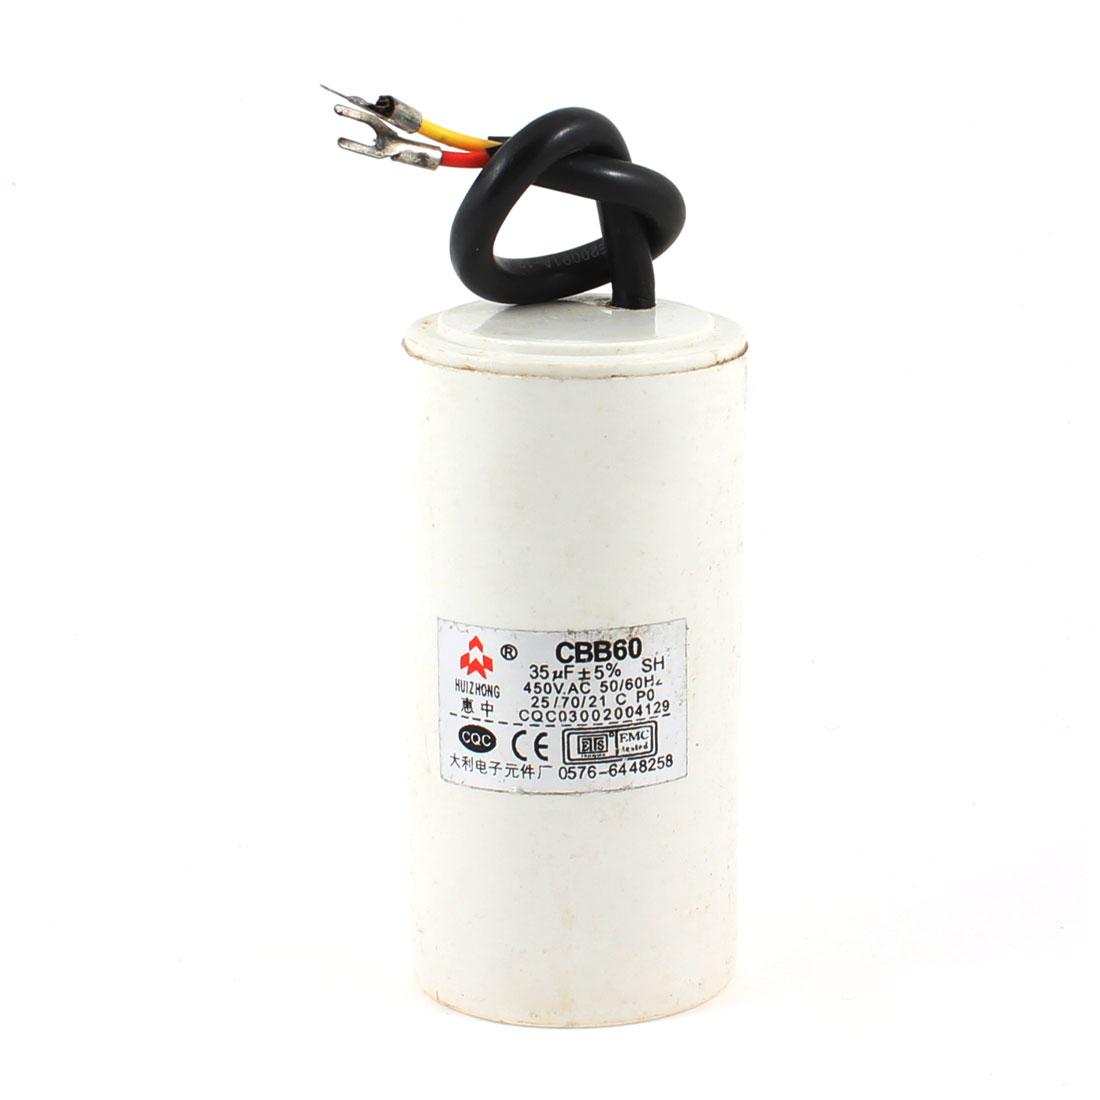 CBB60 AC 450V 35uF Cylindrical Non Polar Motor Capacitor White